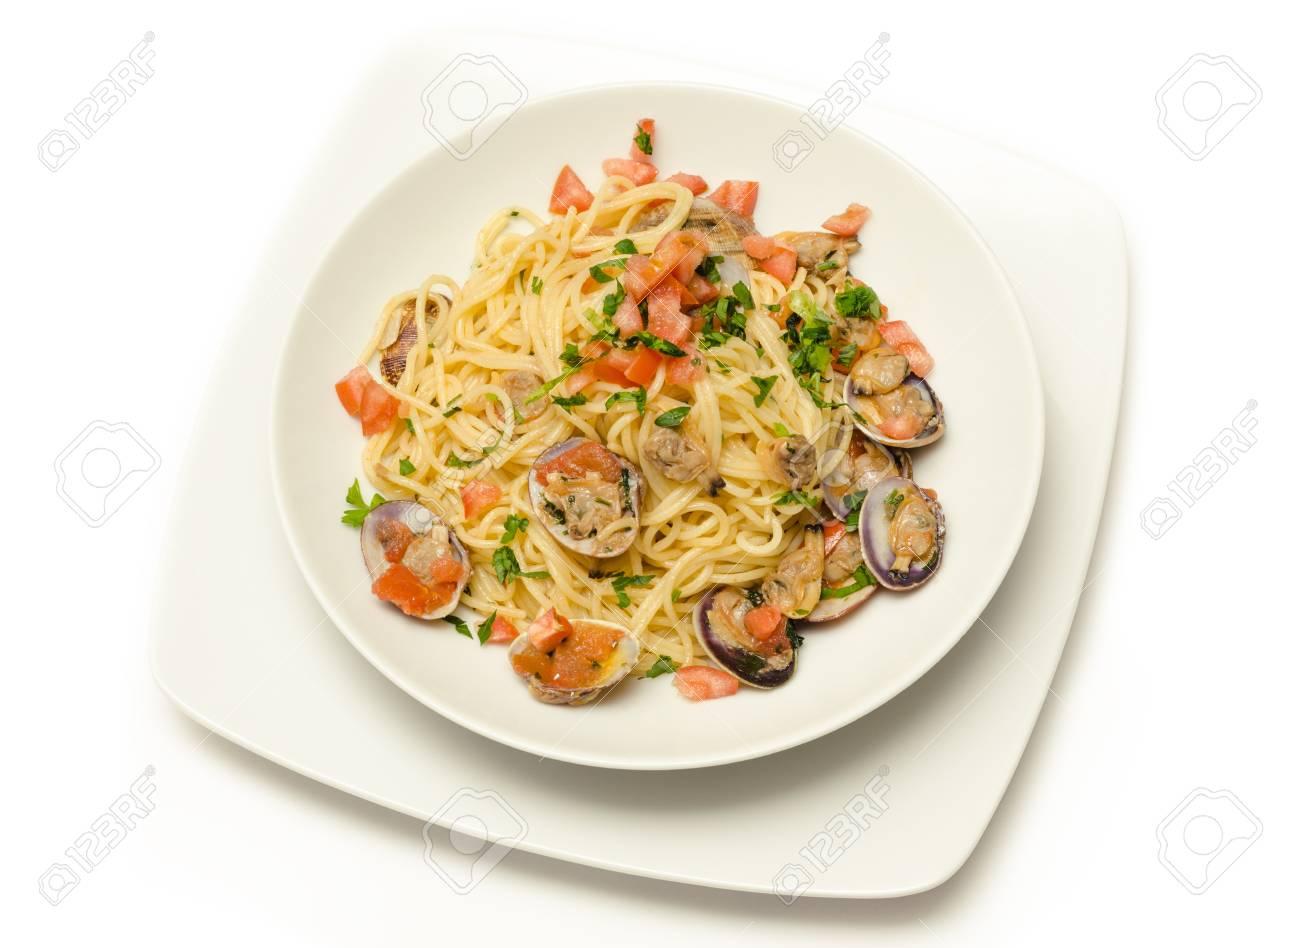 spaghetti with clams and fresh tomato Stock Photo - 18882574